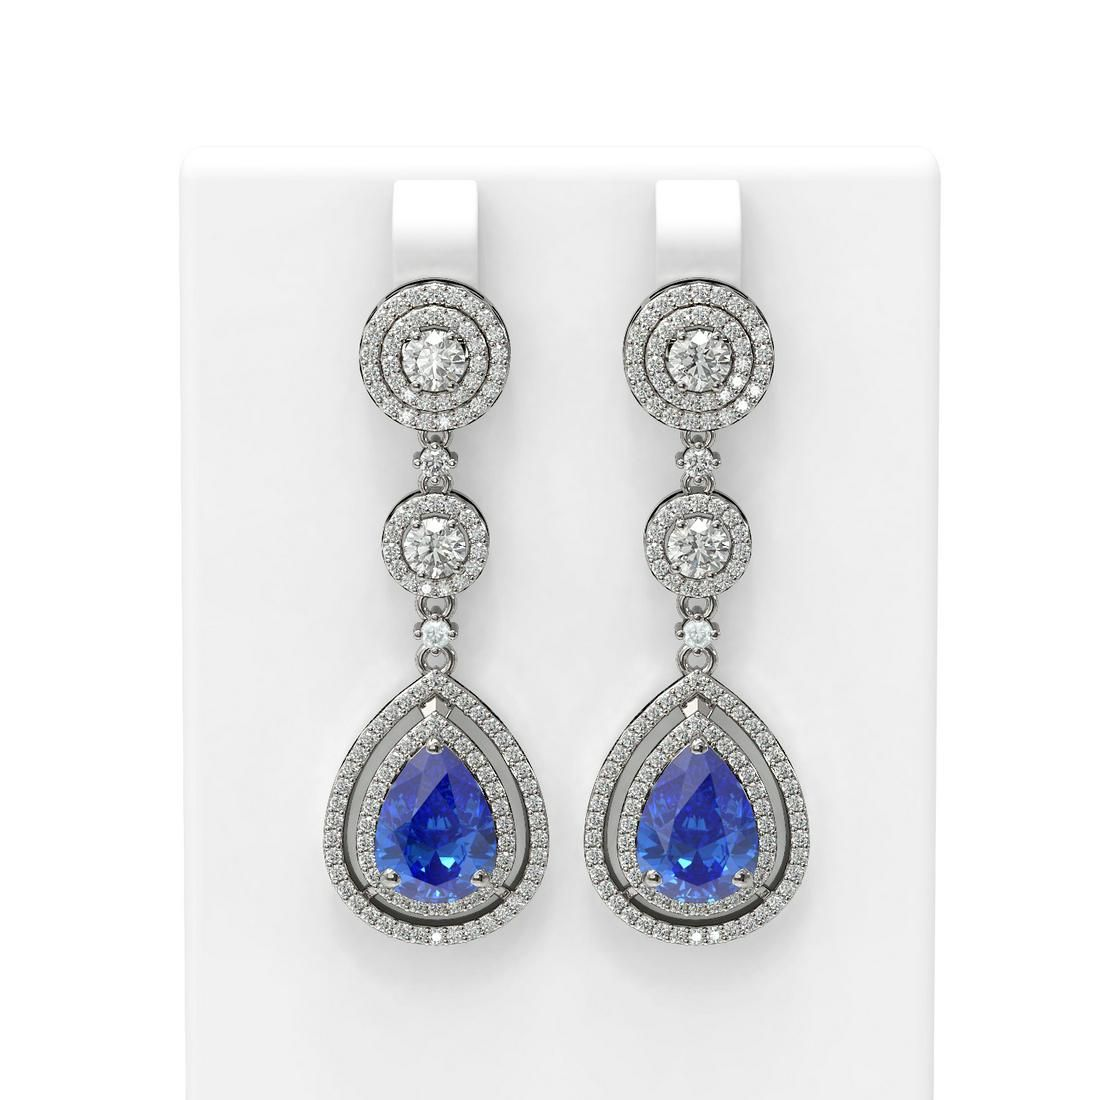 9.52 ctw Tanzanite & Diamond Earrings 18K White Gold -